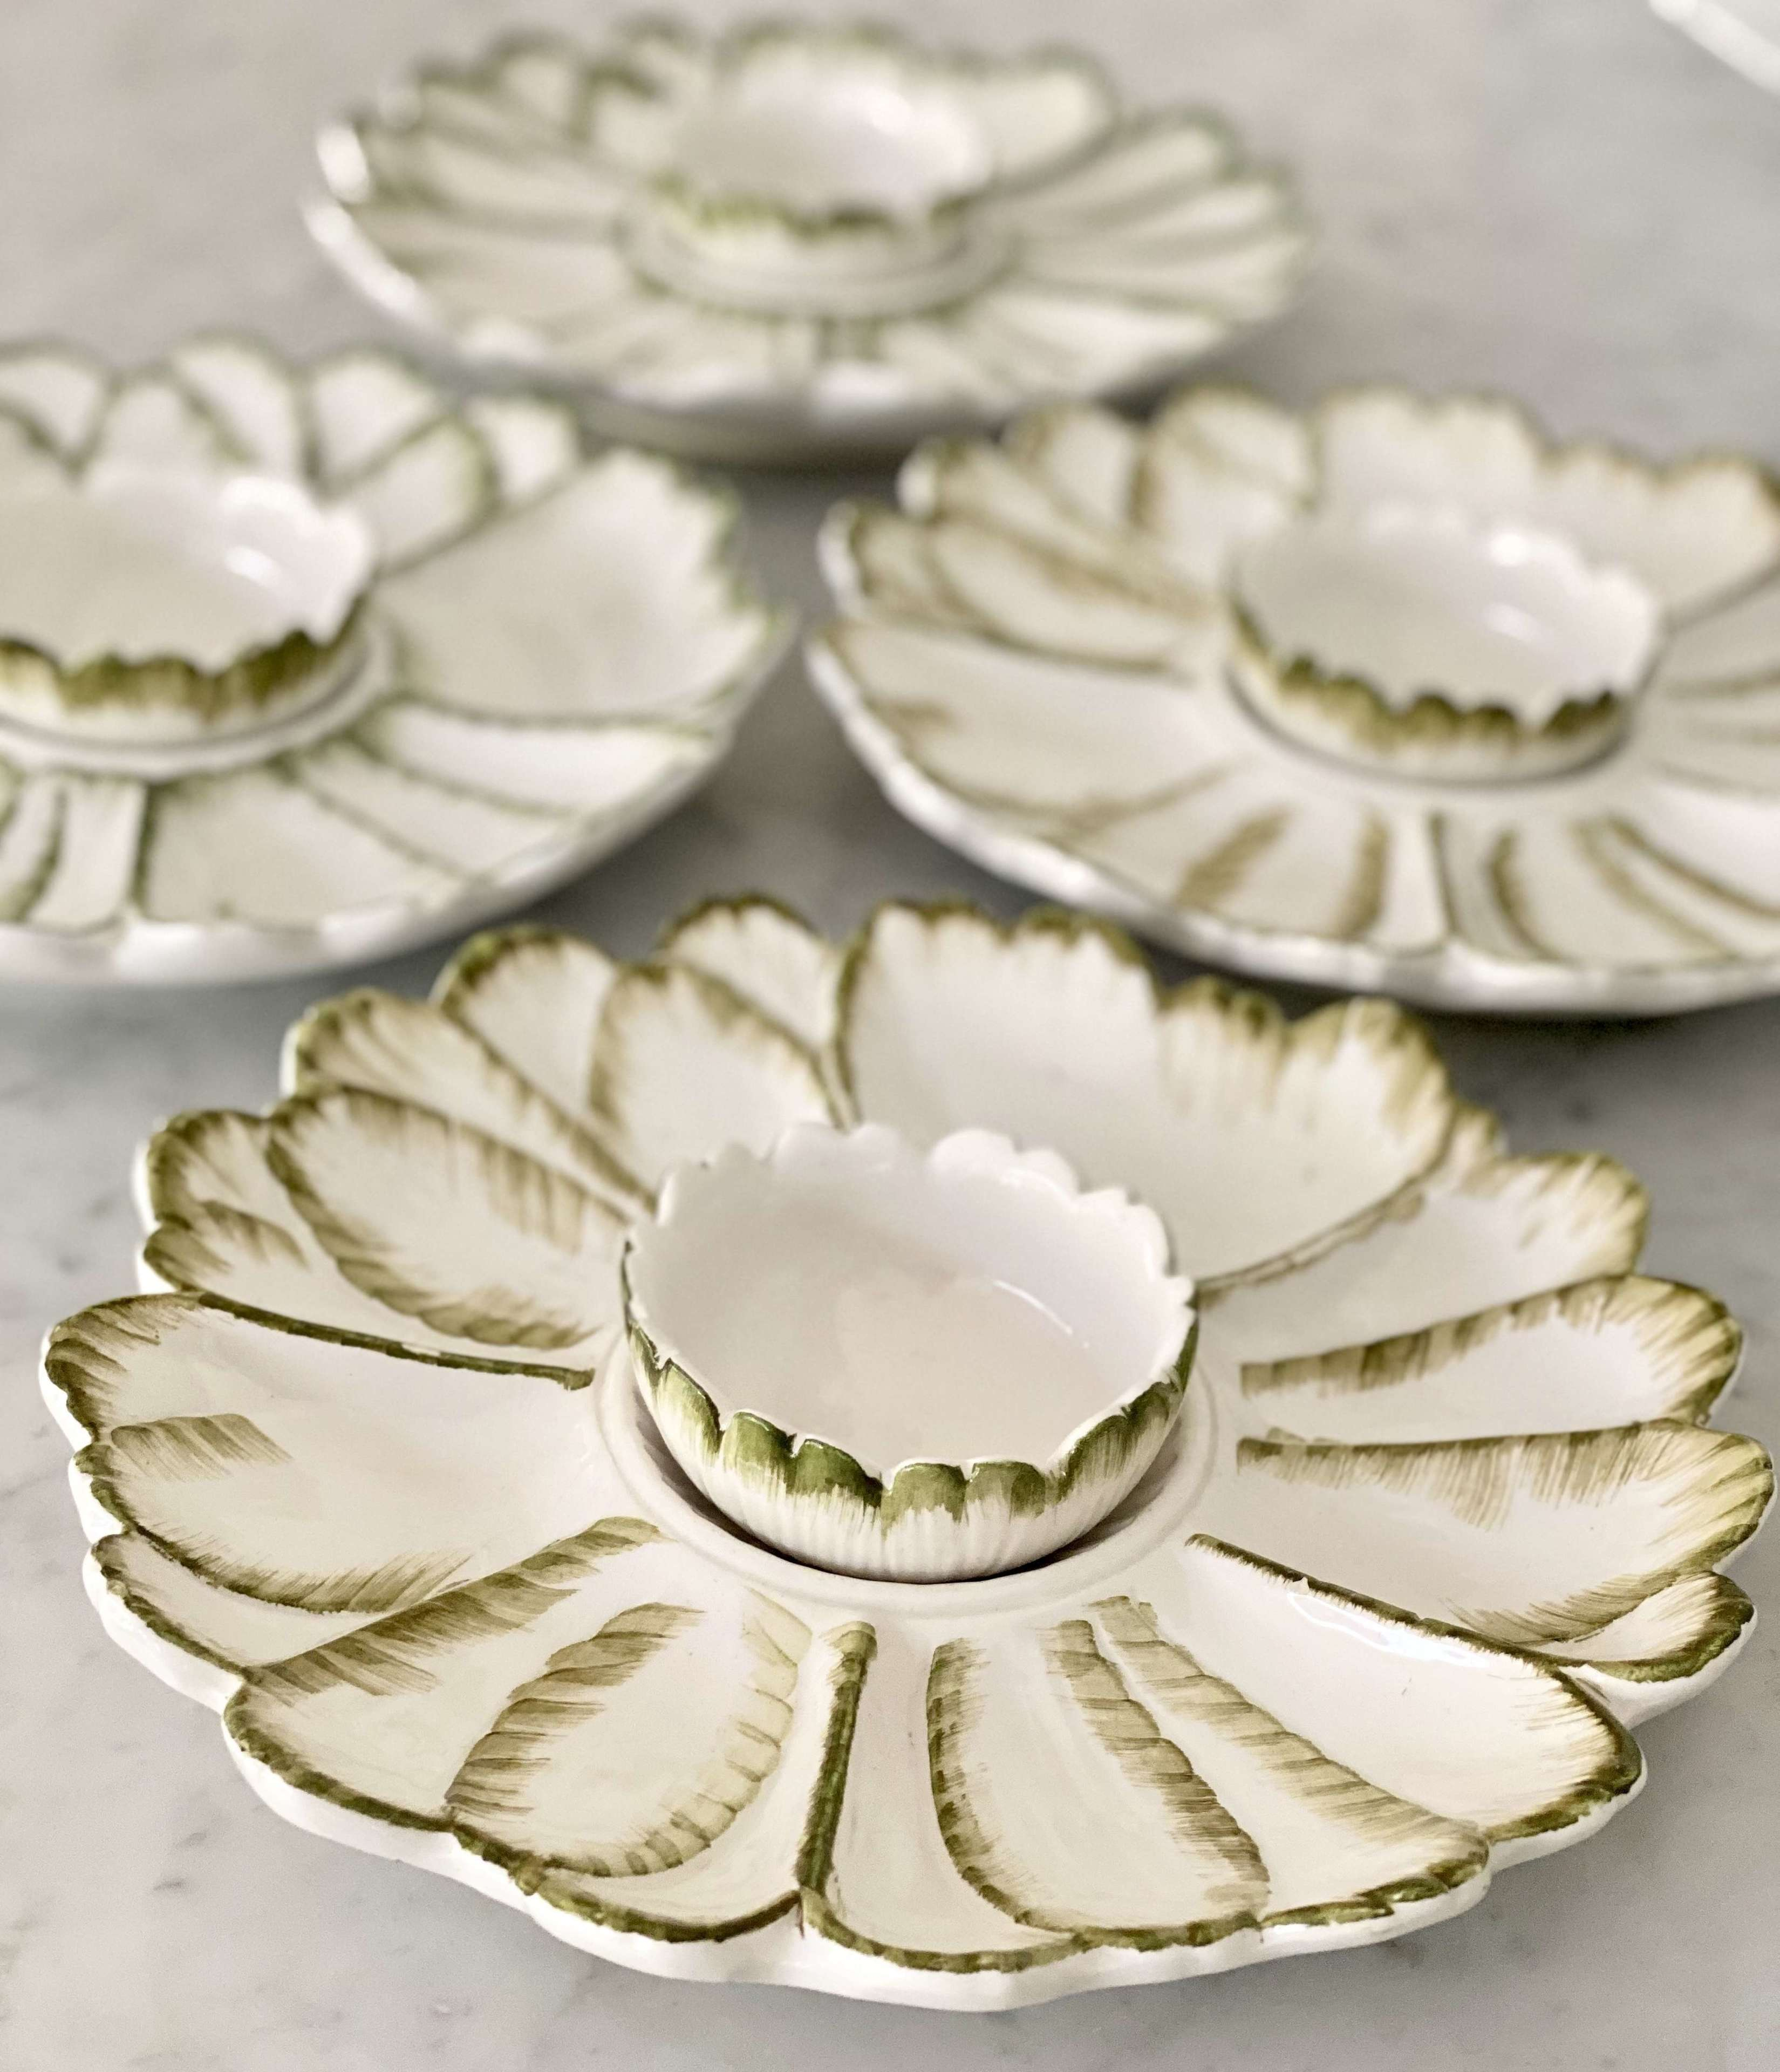 Rustic Italian ceramic crudités bowl sets Circa 1950